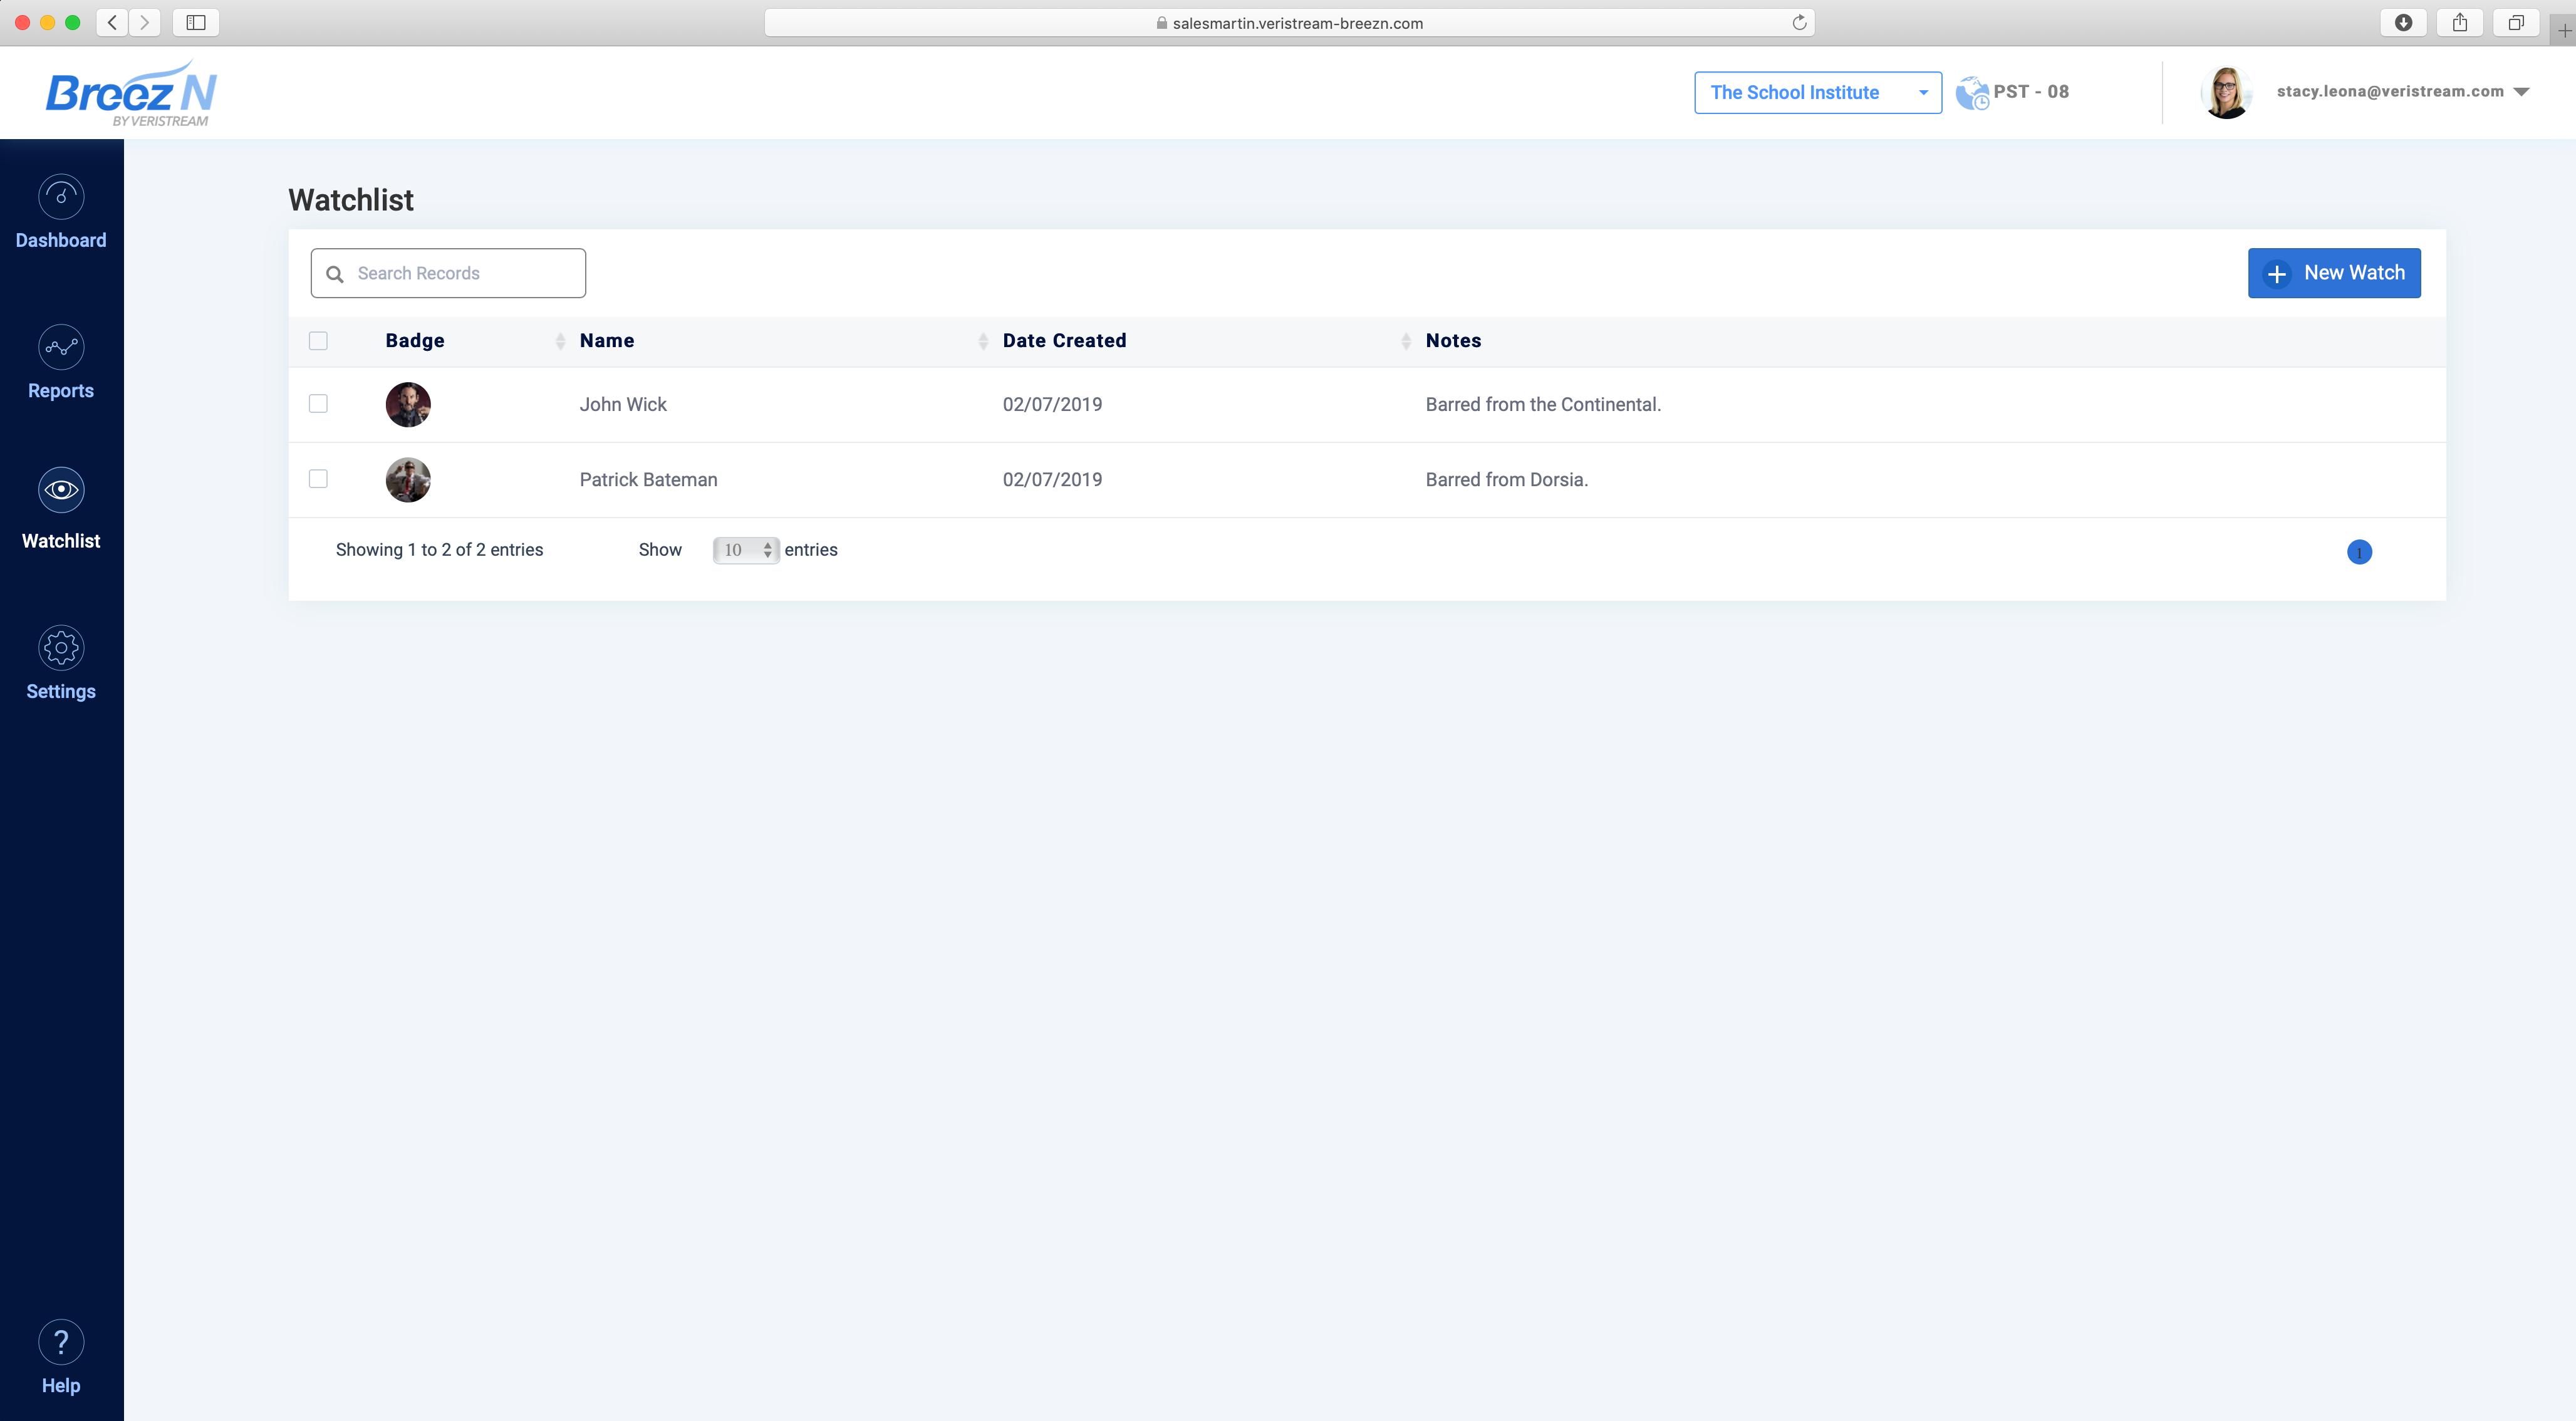 iVisitor Software - Watchlist